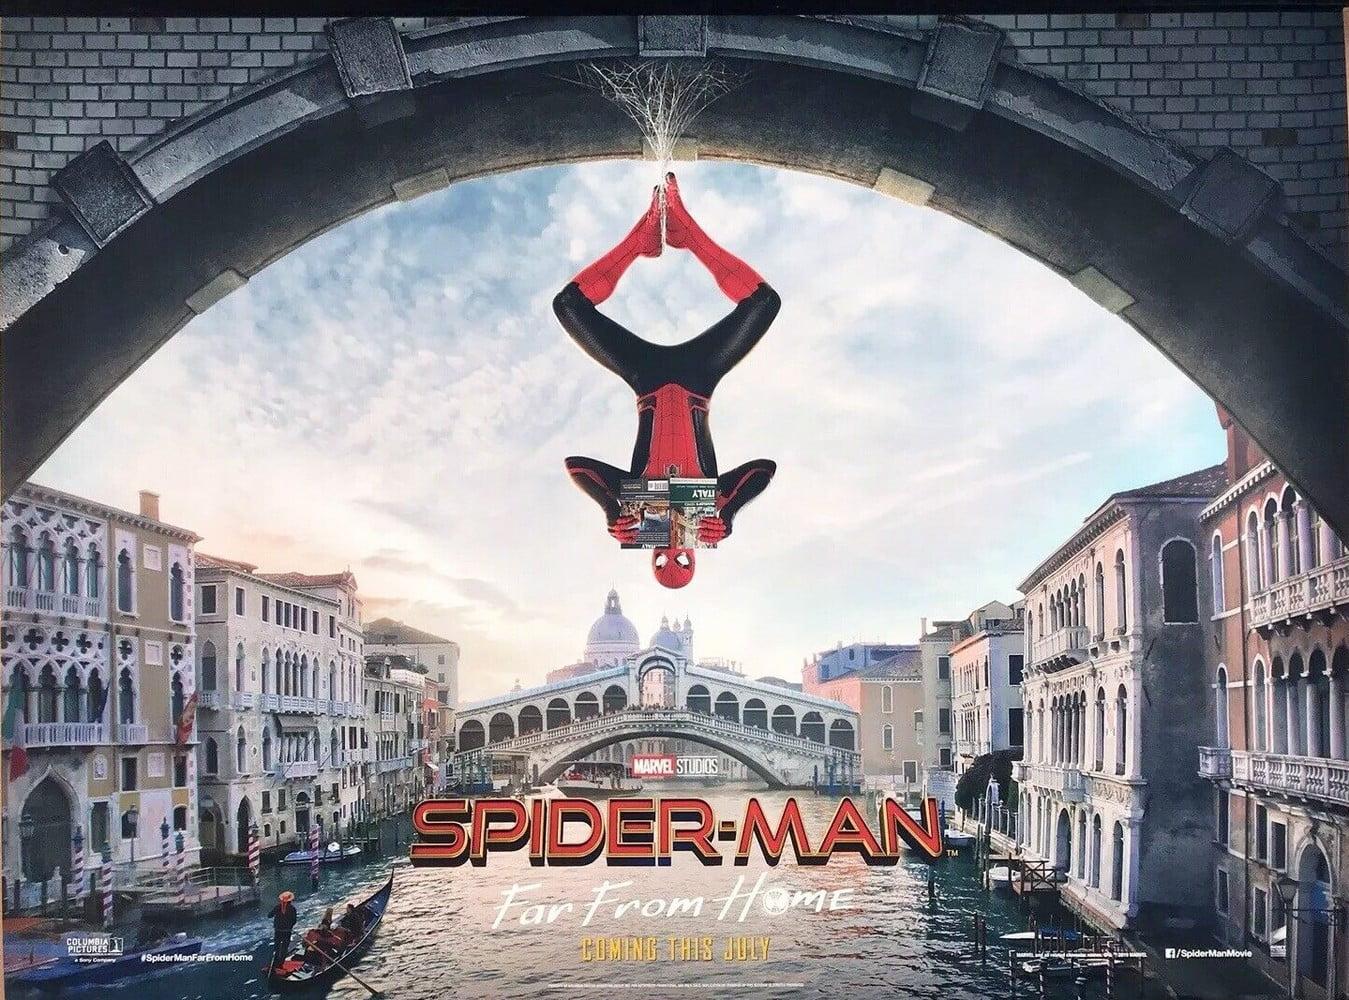 Spidermanfarfromhome8